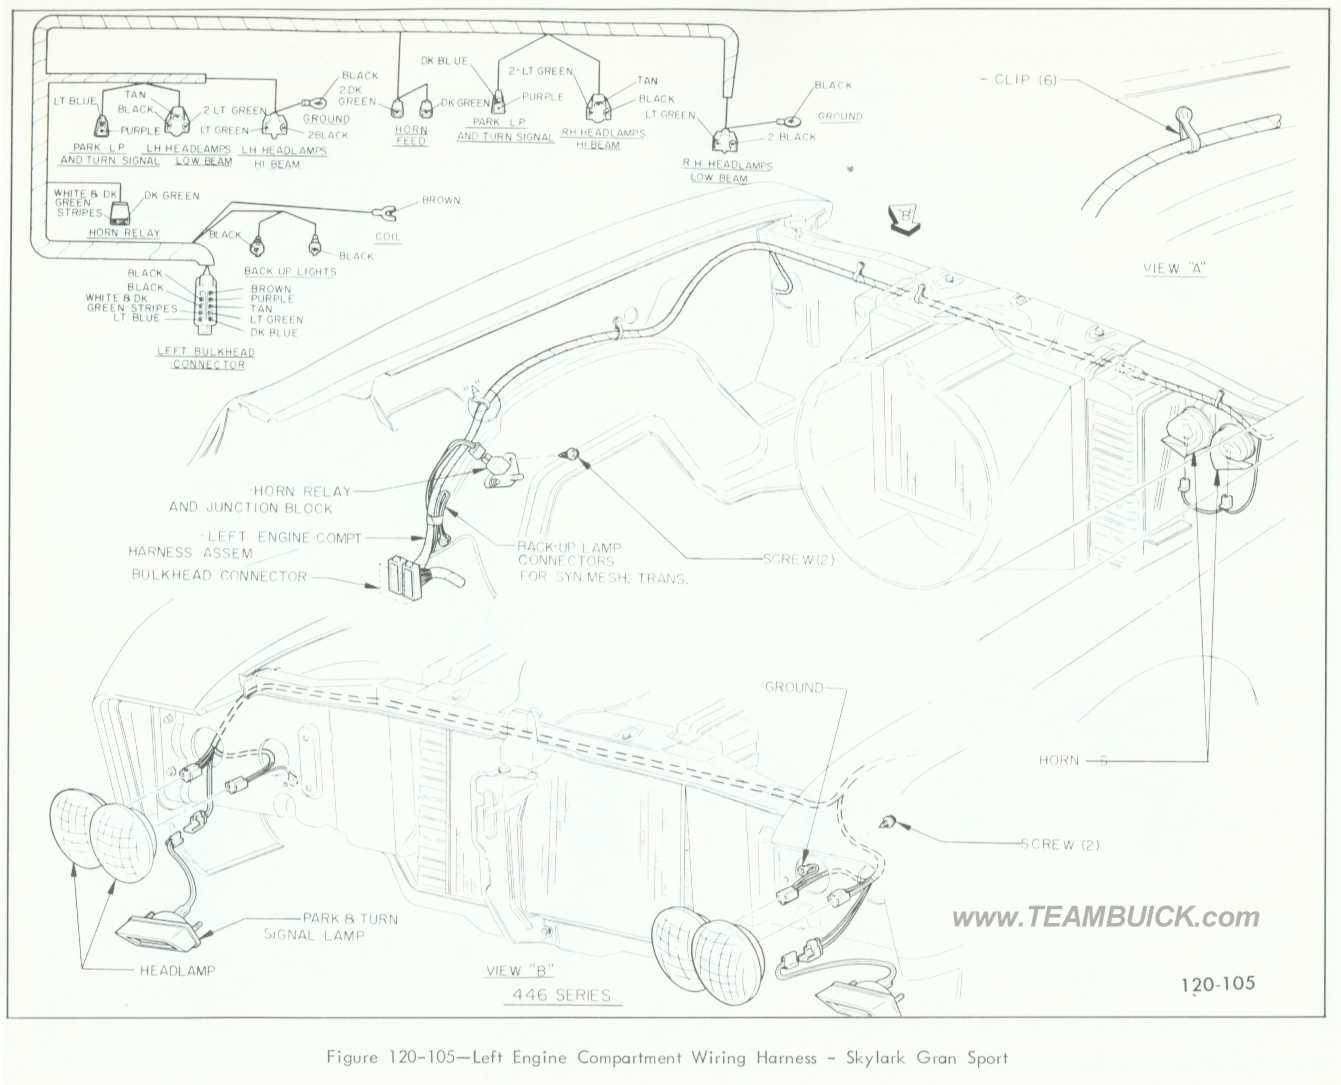 66 buick skylark wiring diagram